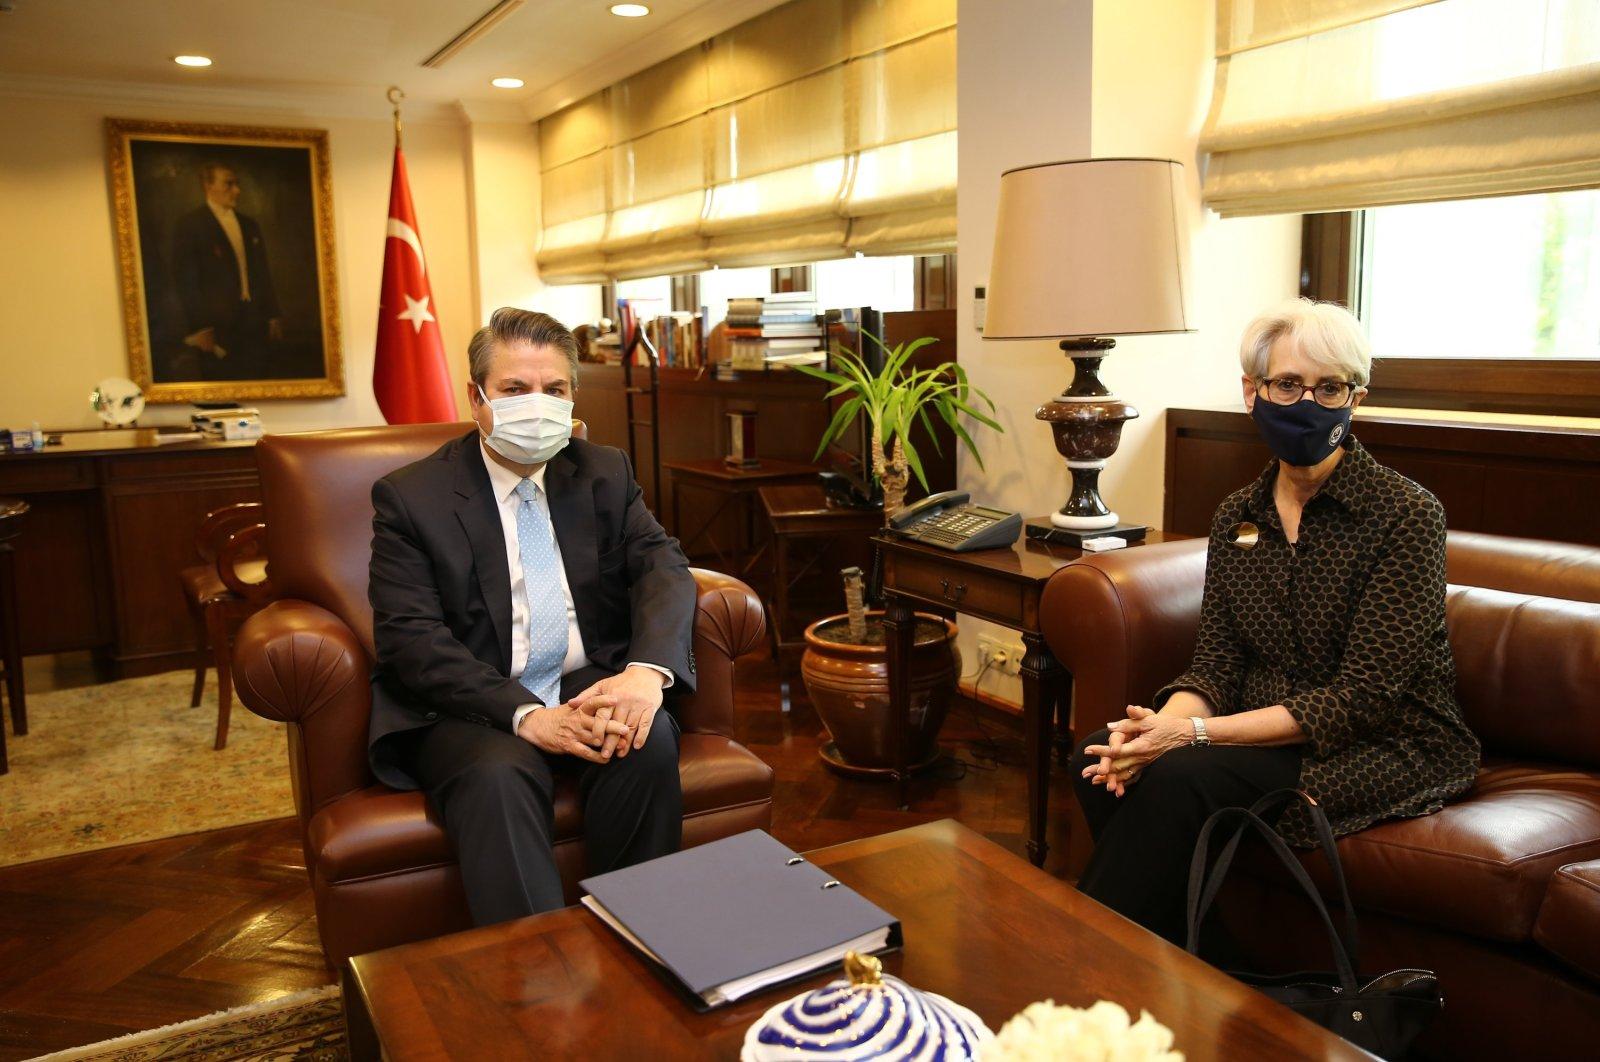 Turkey Deputy Foreign Minister Sedat Önal (L) and U.S. Deputy Secretary of State Wendy Sherman sit during discussions in Ankara, Turkey, May 27, 2021. (AA Photo)